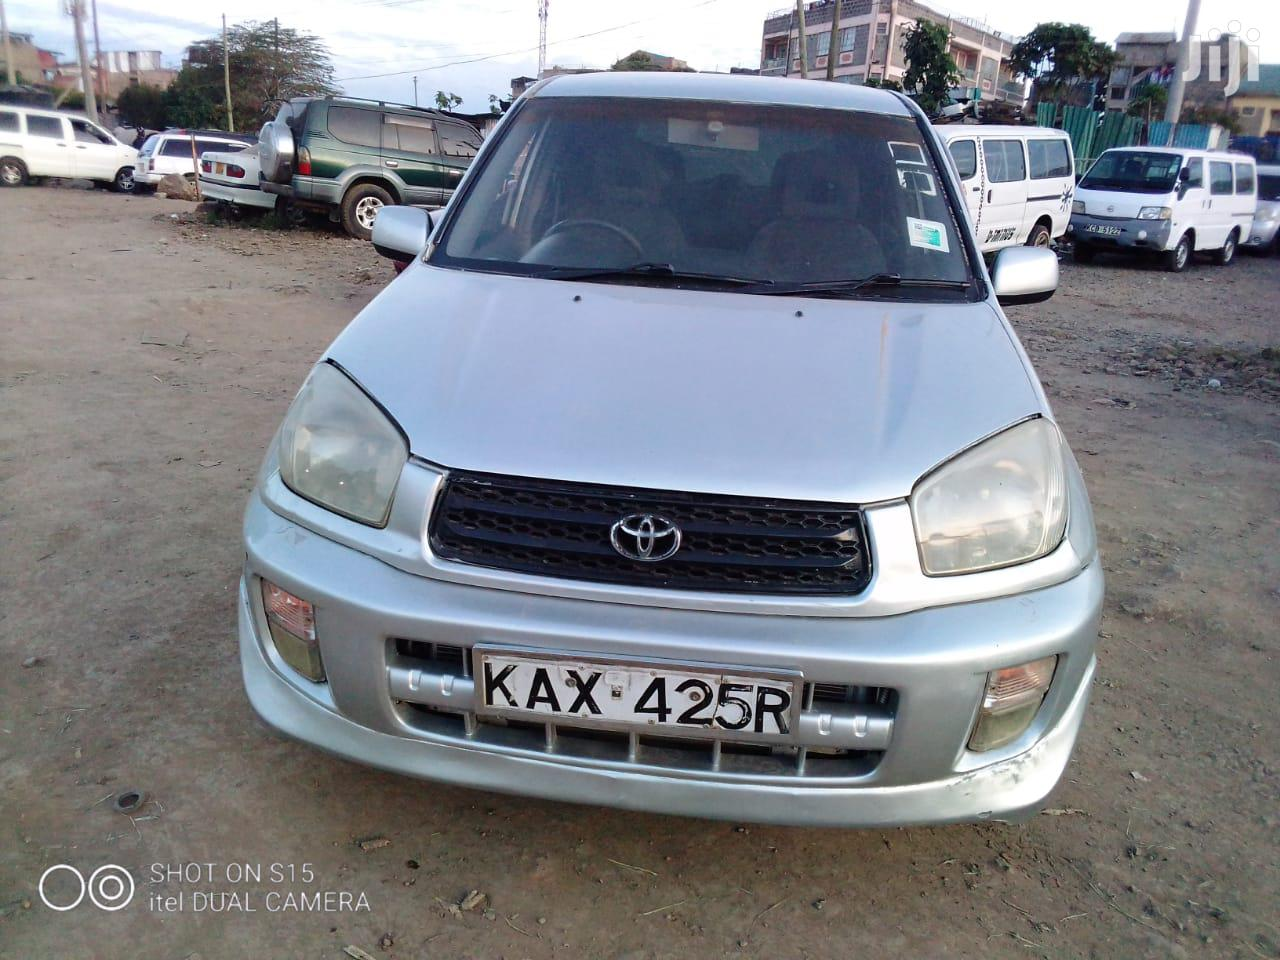 Toyota RAV4 2005 Silver | Cars for sale in Umoja II, Umoja I, Kenya